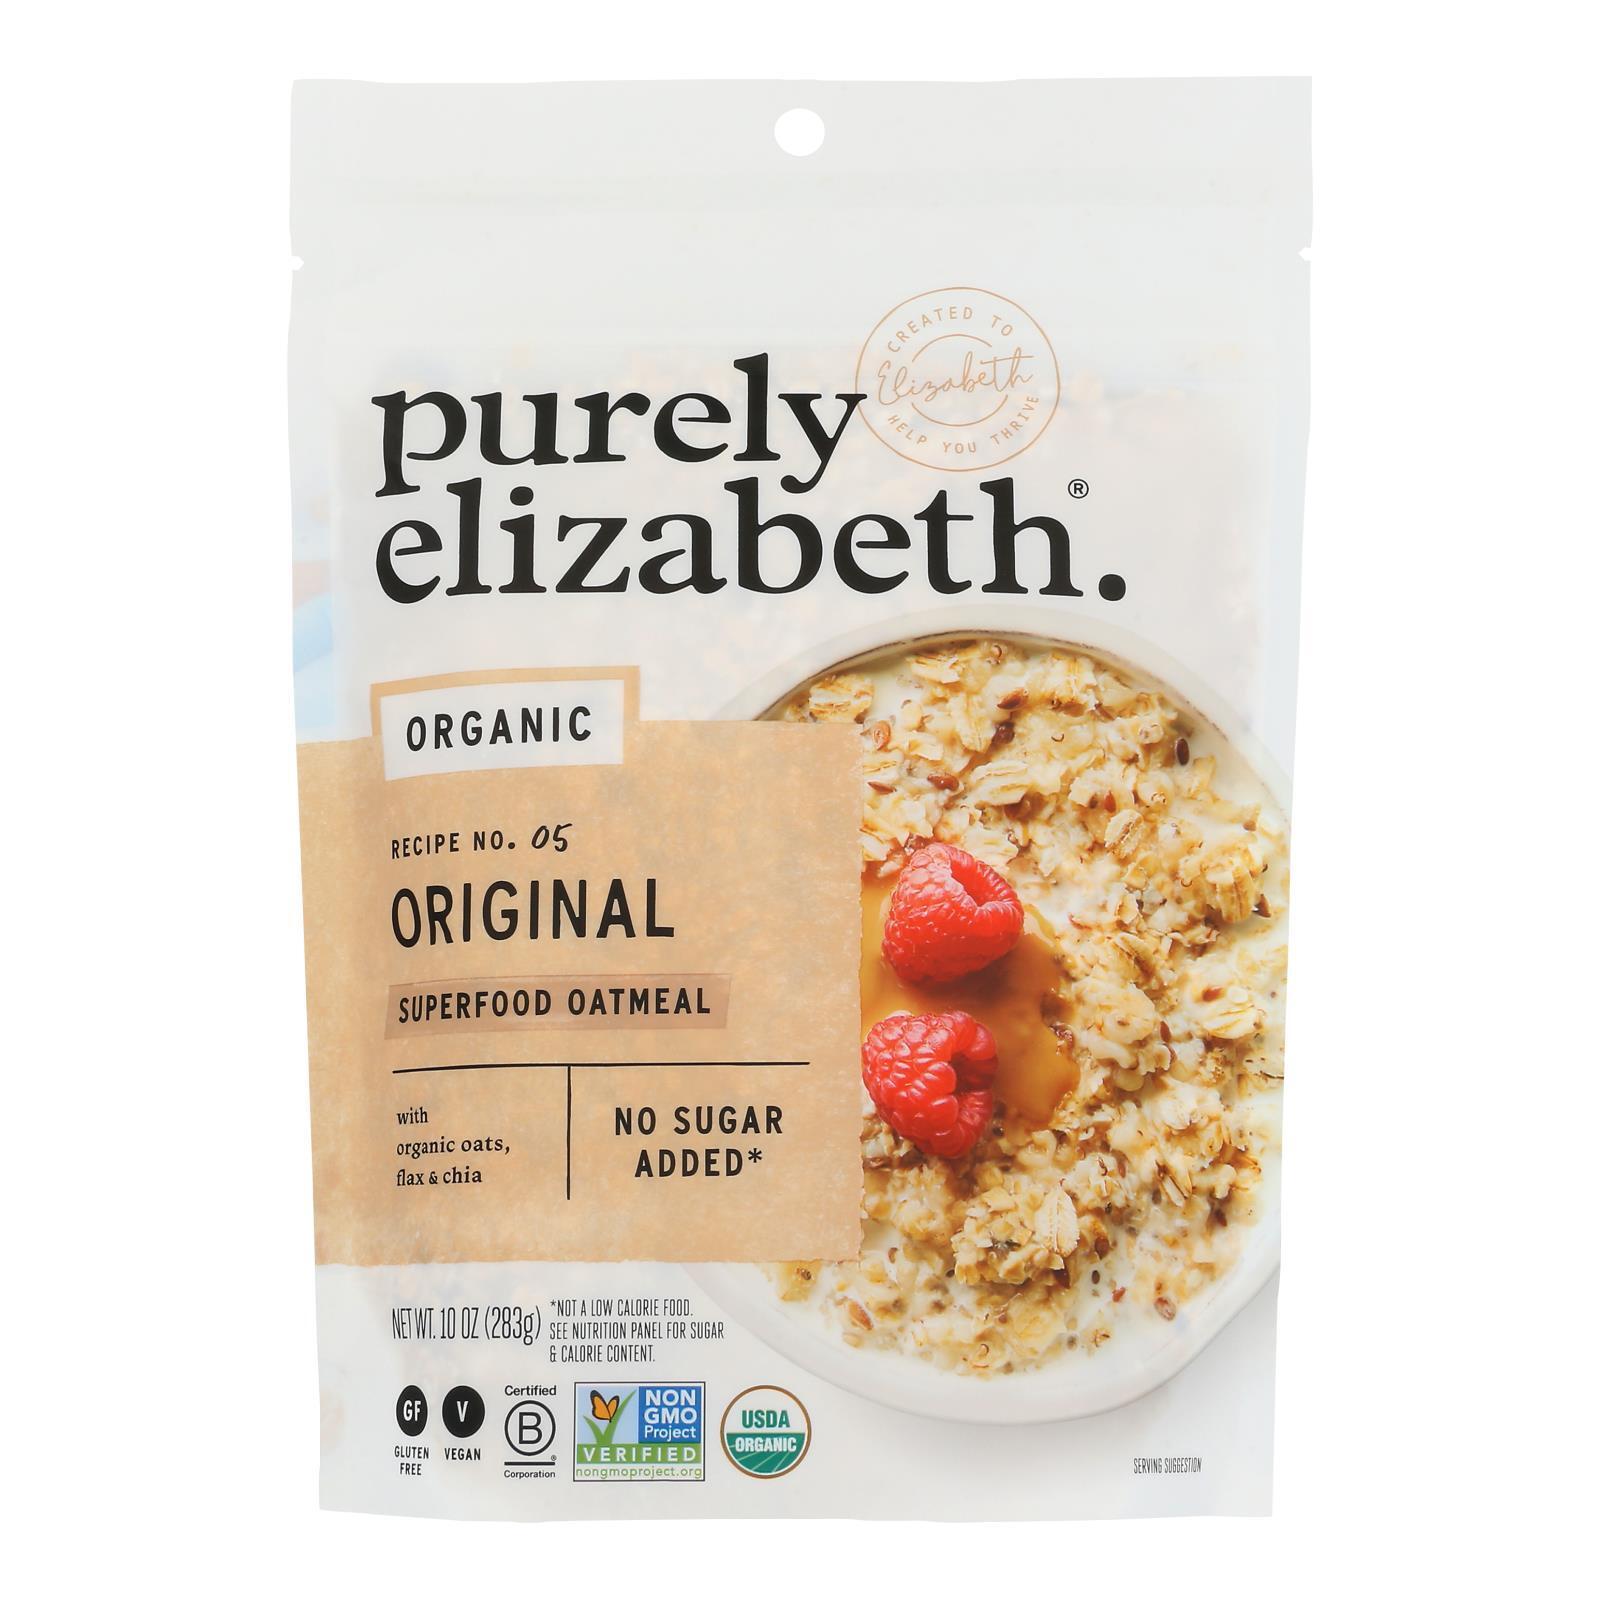 Purely Elizabeth Oatmeal - Organic - Ancient Grain - Original - 10 oz - case of 6